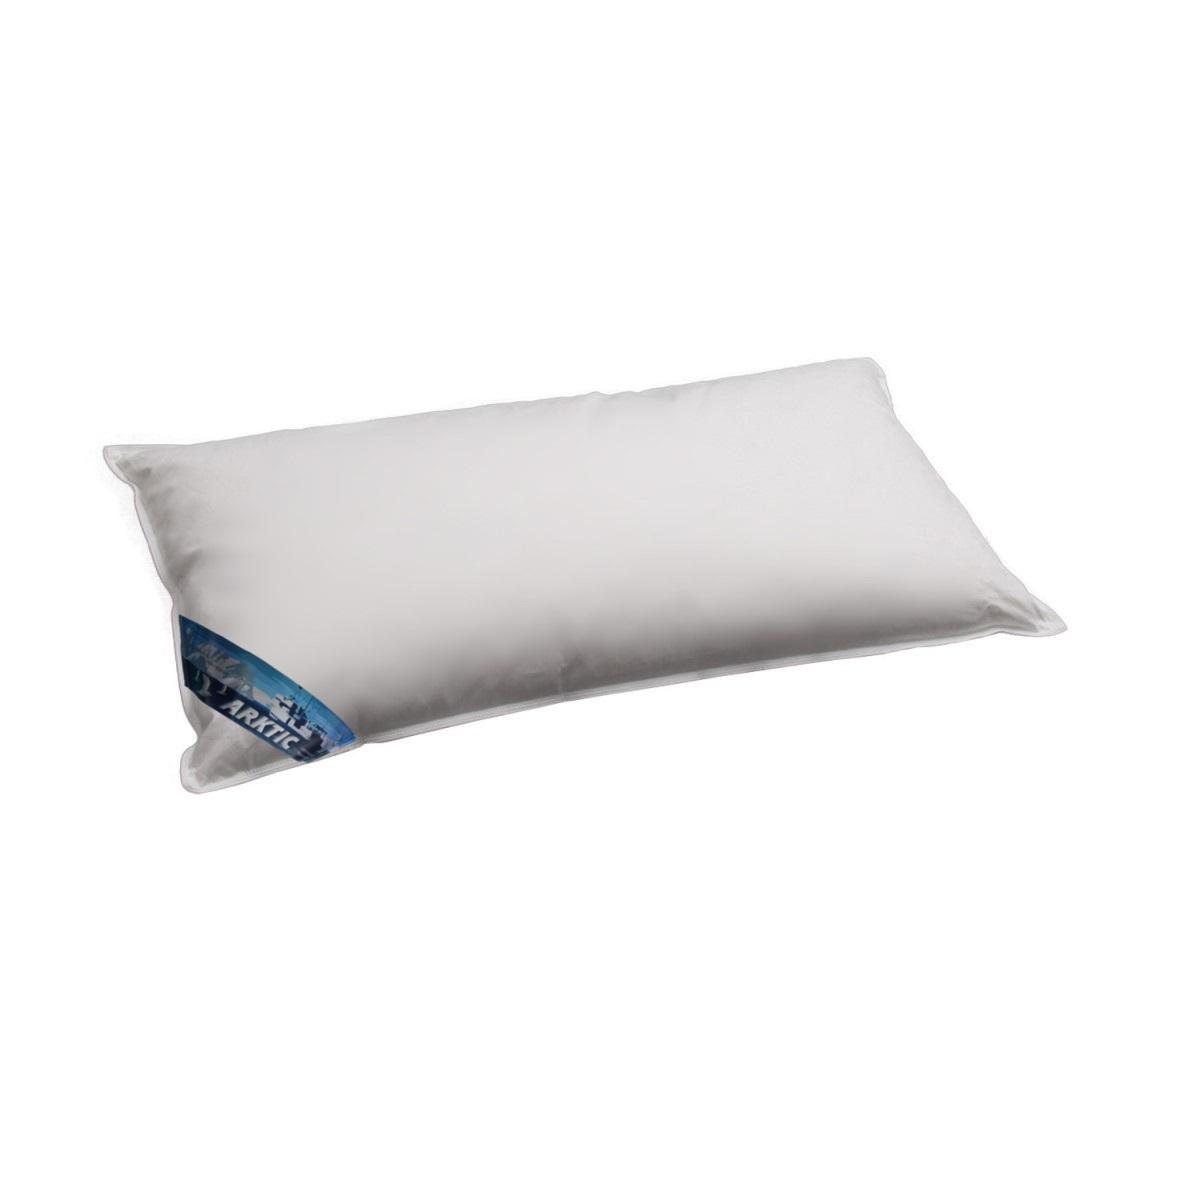 ARKTIC Daunenkissen arktischer Daunenflaum 100 % Daunen 40x80 cm weich